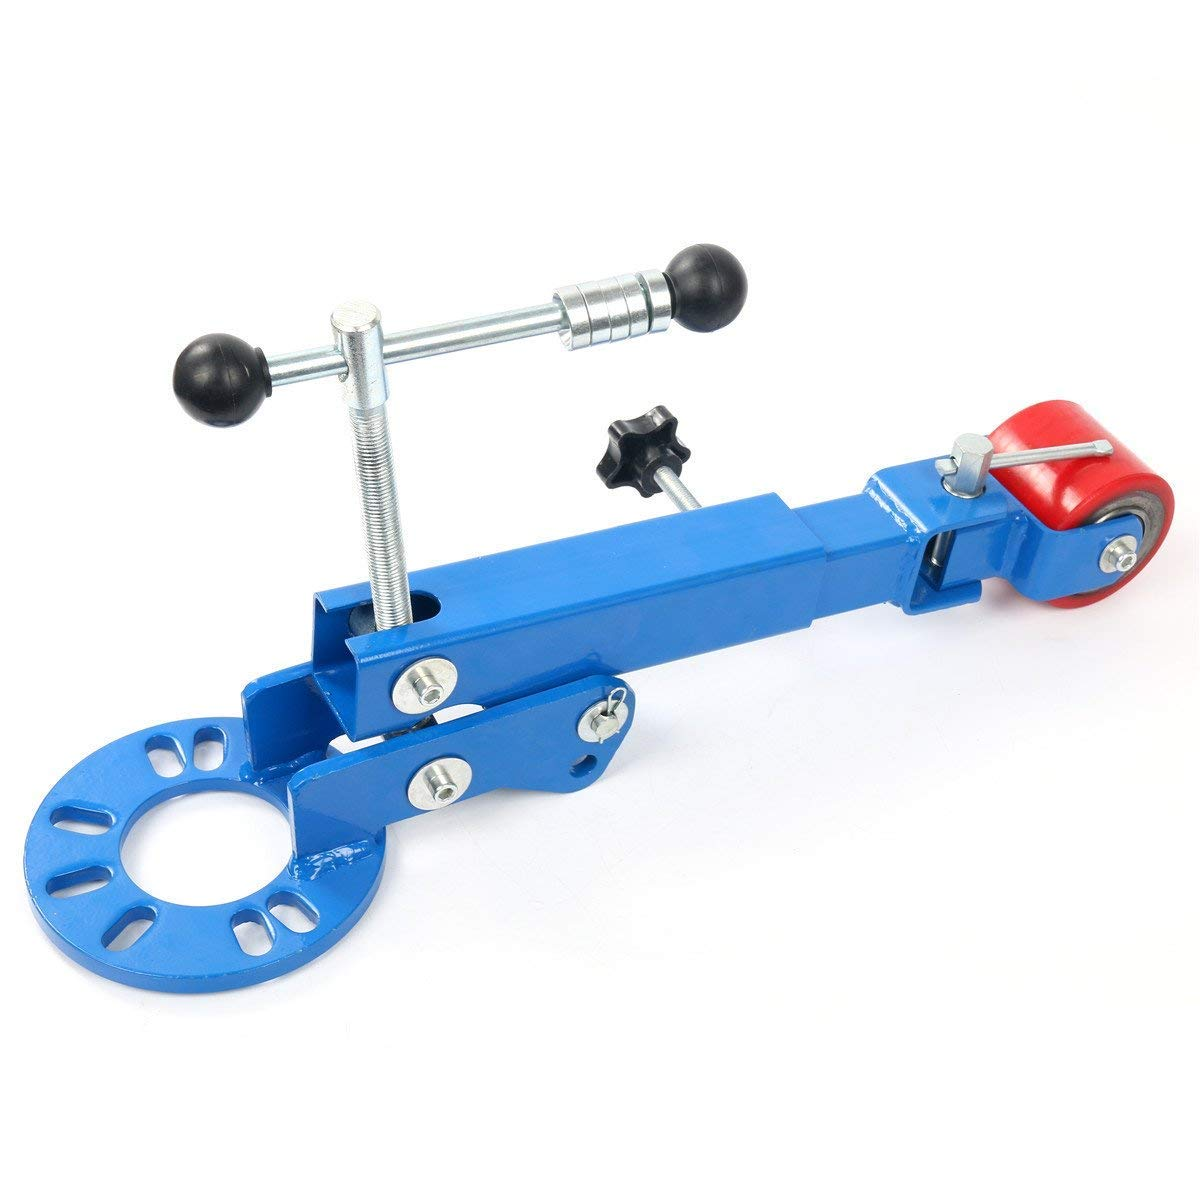 8MILELAKE Fender Roller Wheel Arch Roller Flaring Former Reforming Extending Tool freebirdtrading